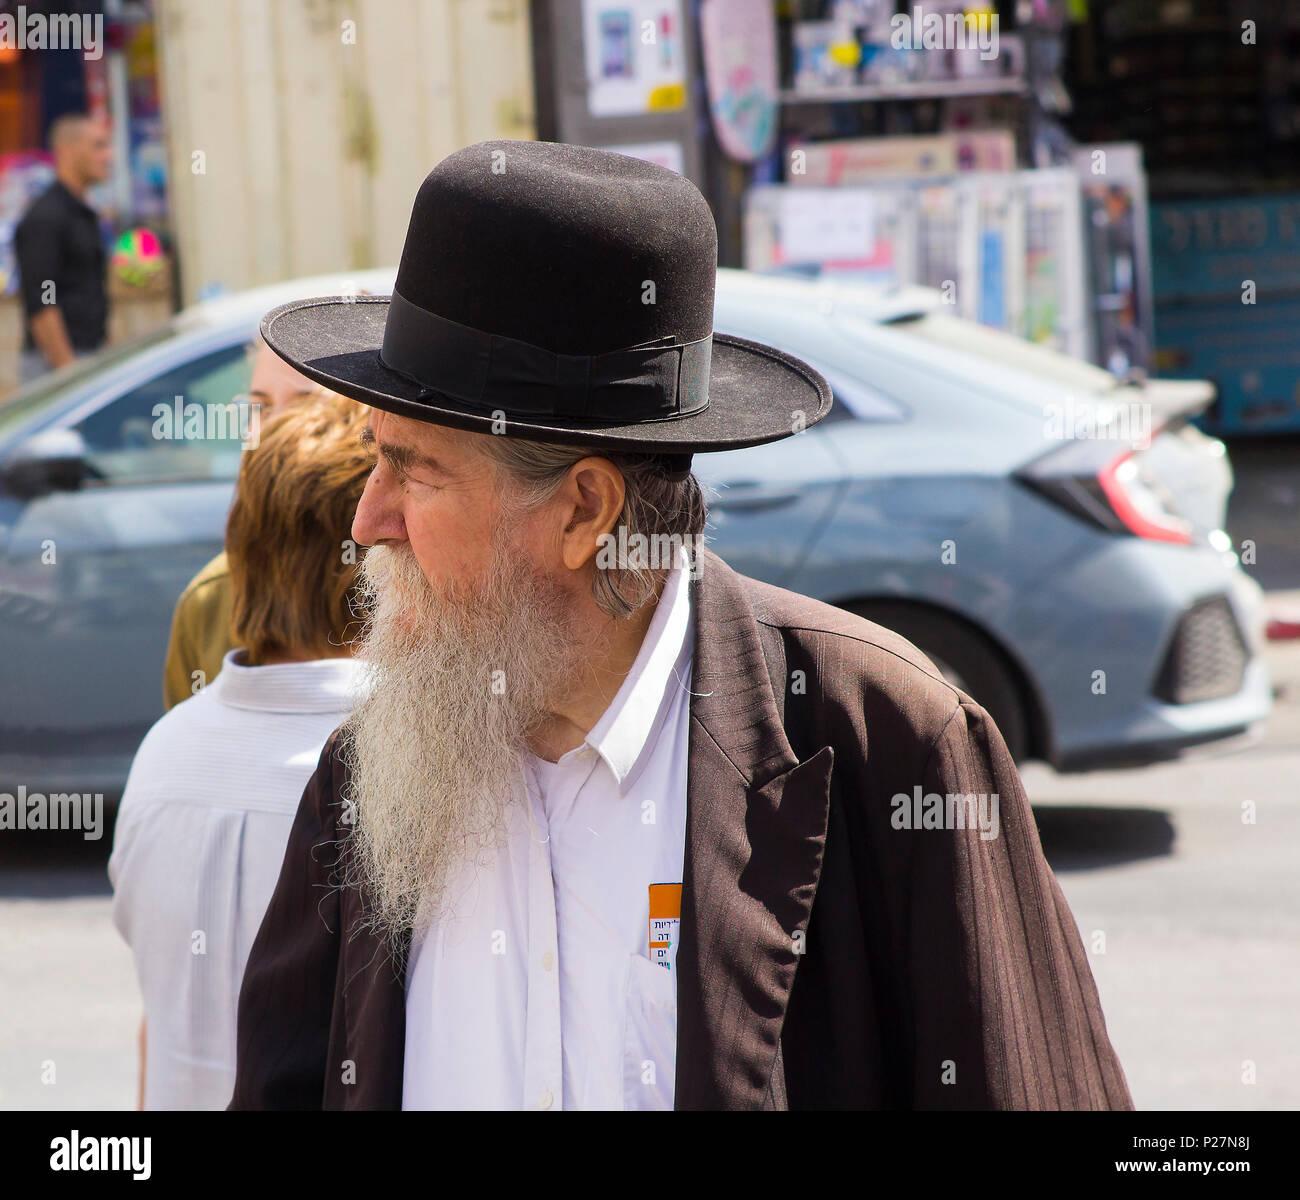 Colorful Old Man Long Beard Stockfotos & Colorful Old Man Long Beard ...